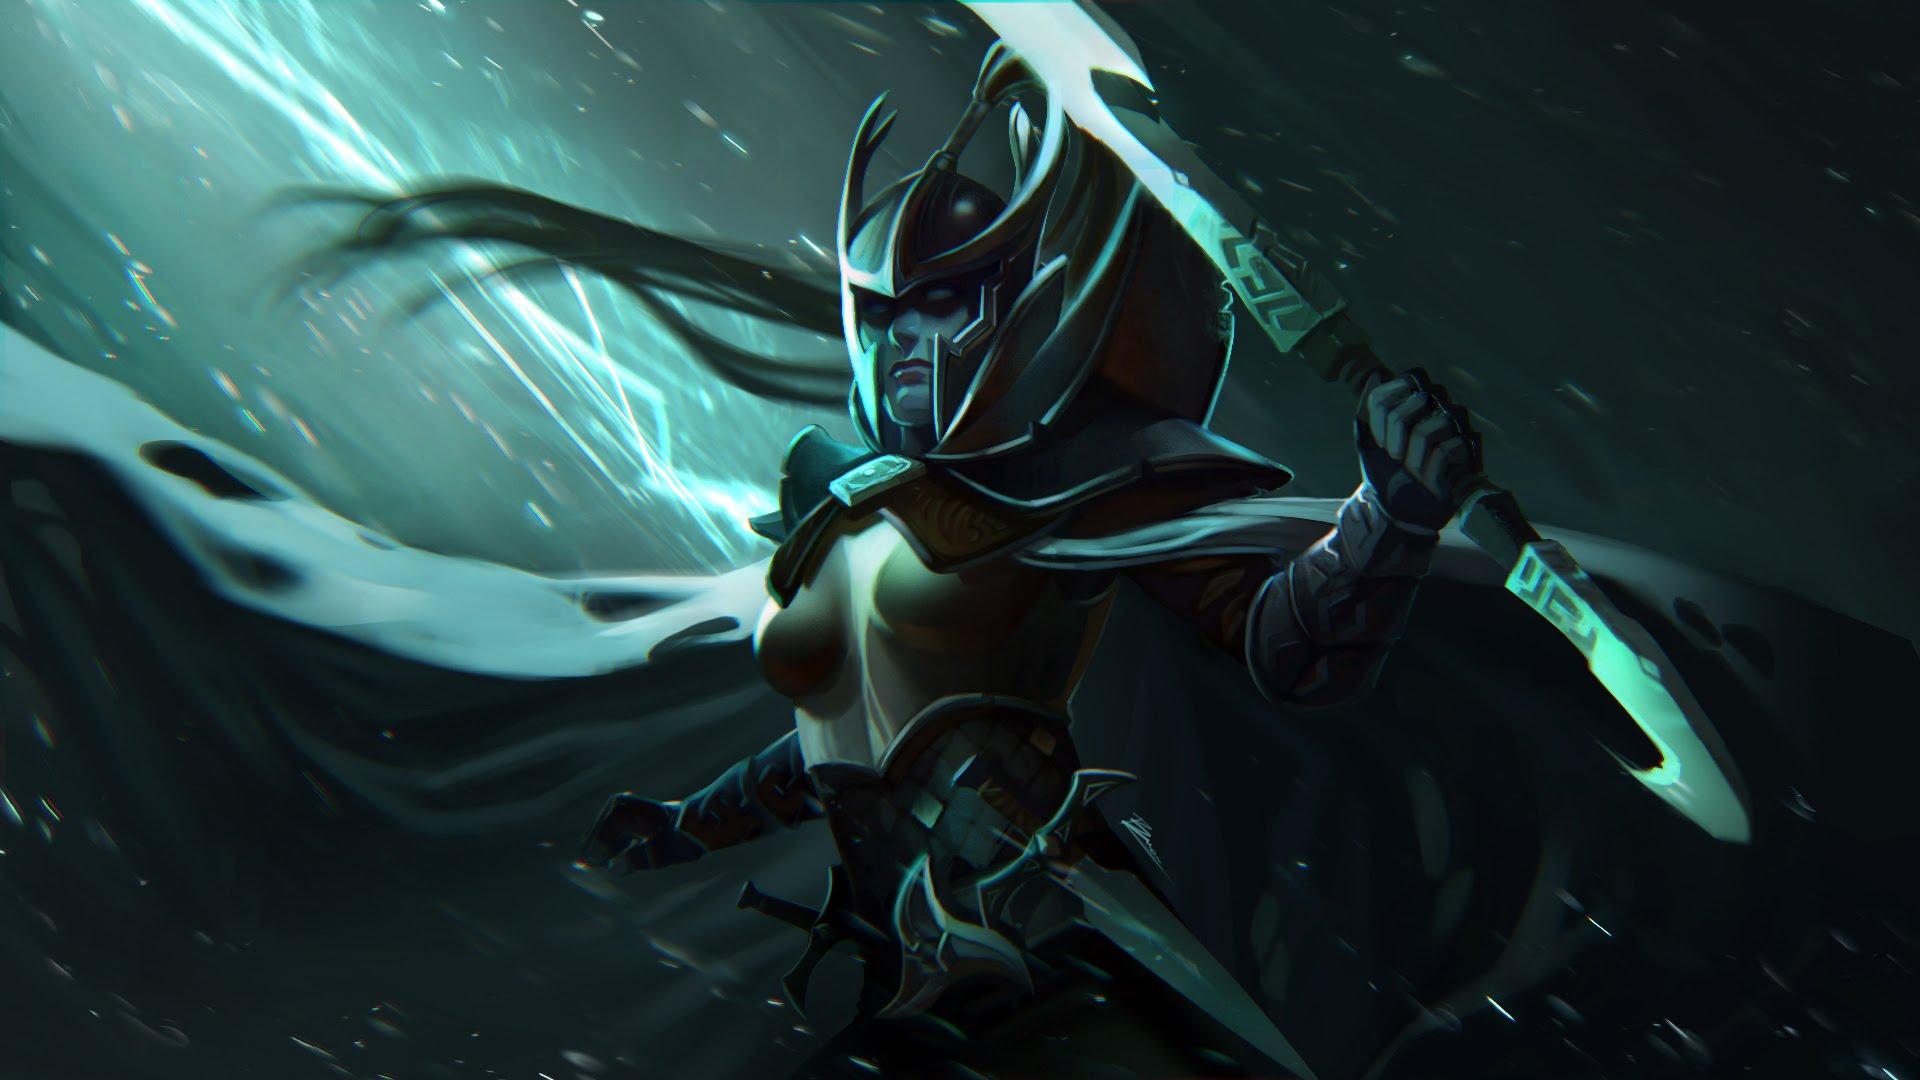 6_dota2-phantom-assassin